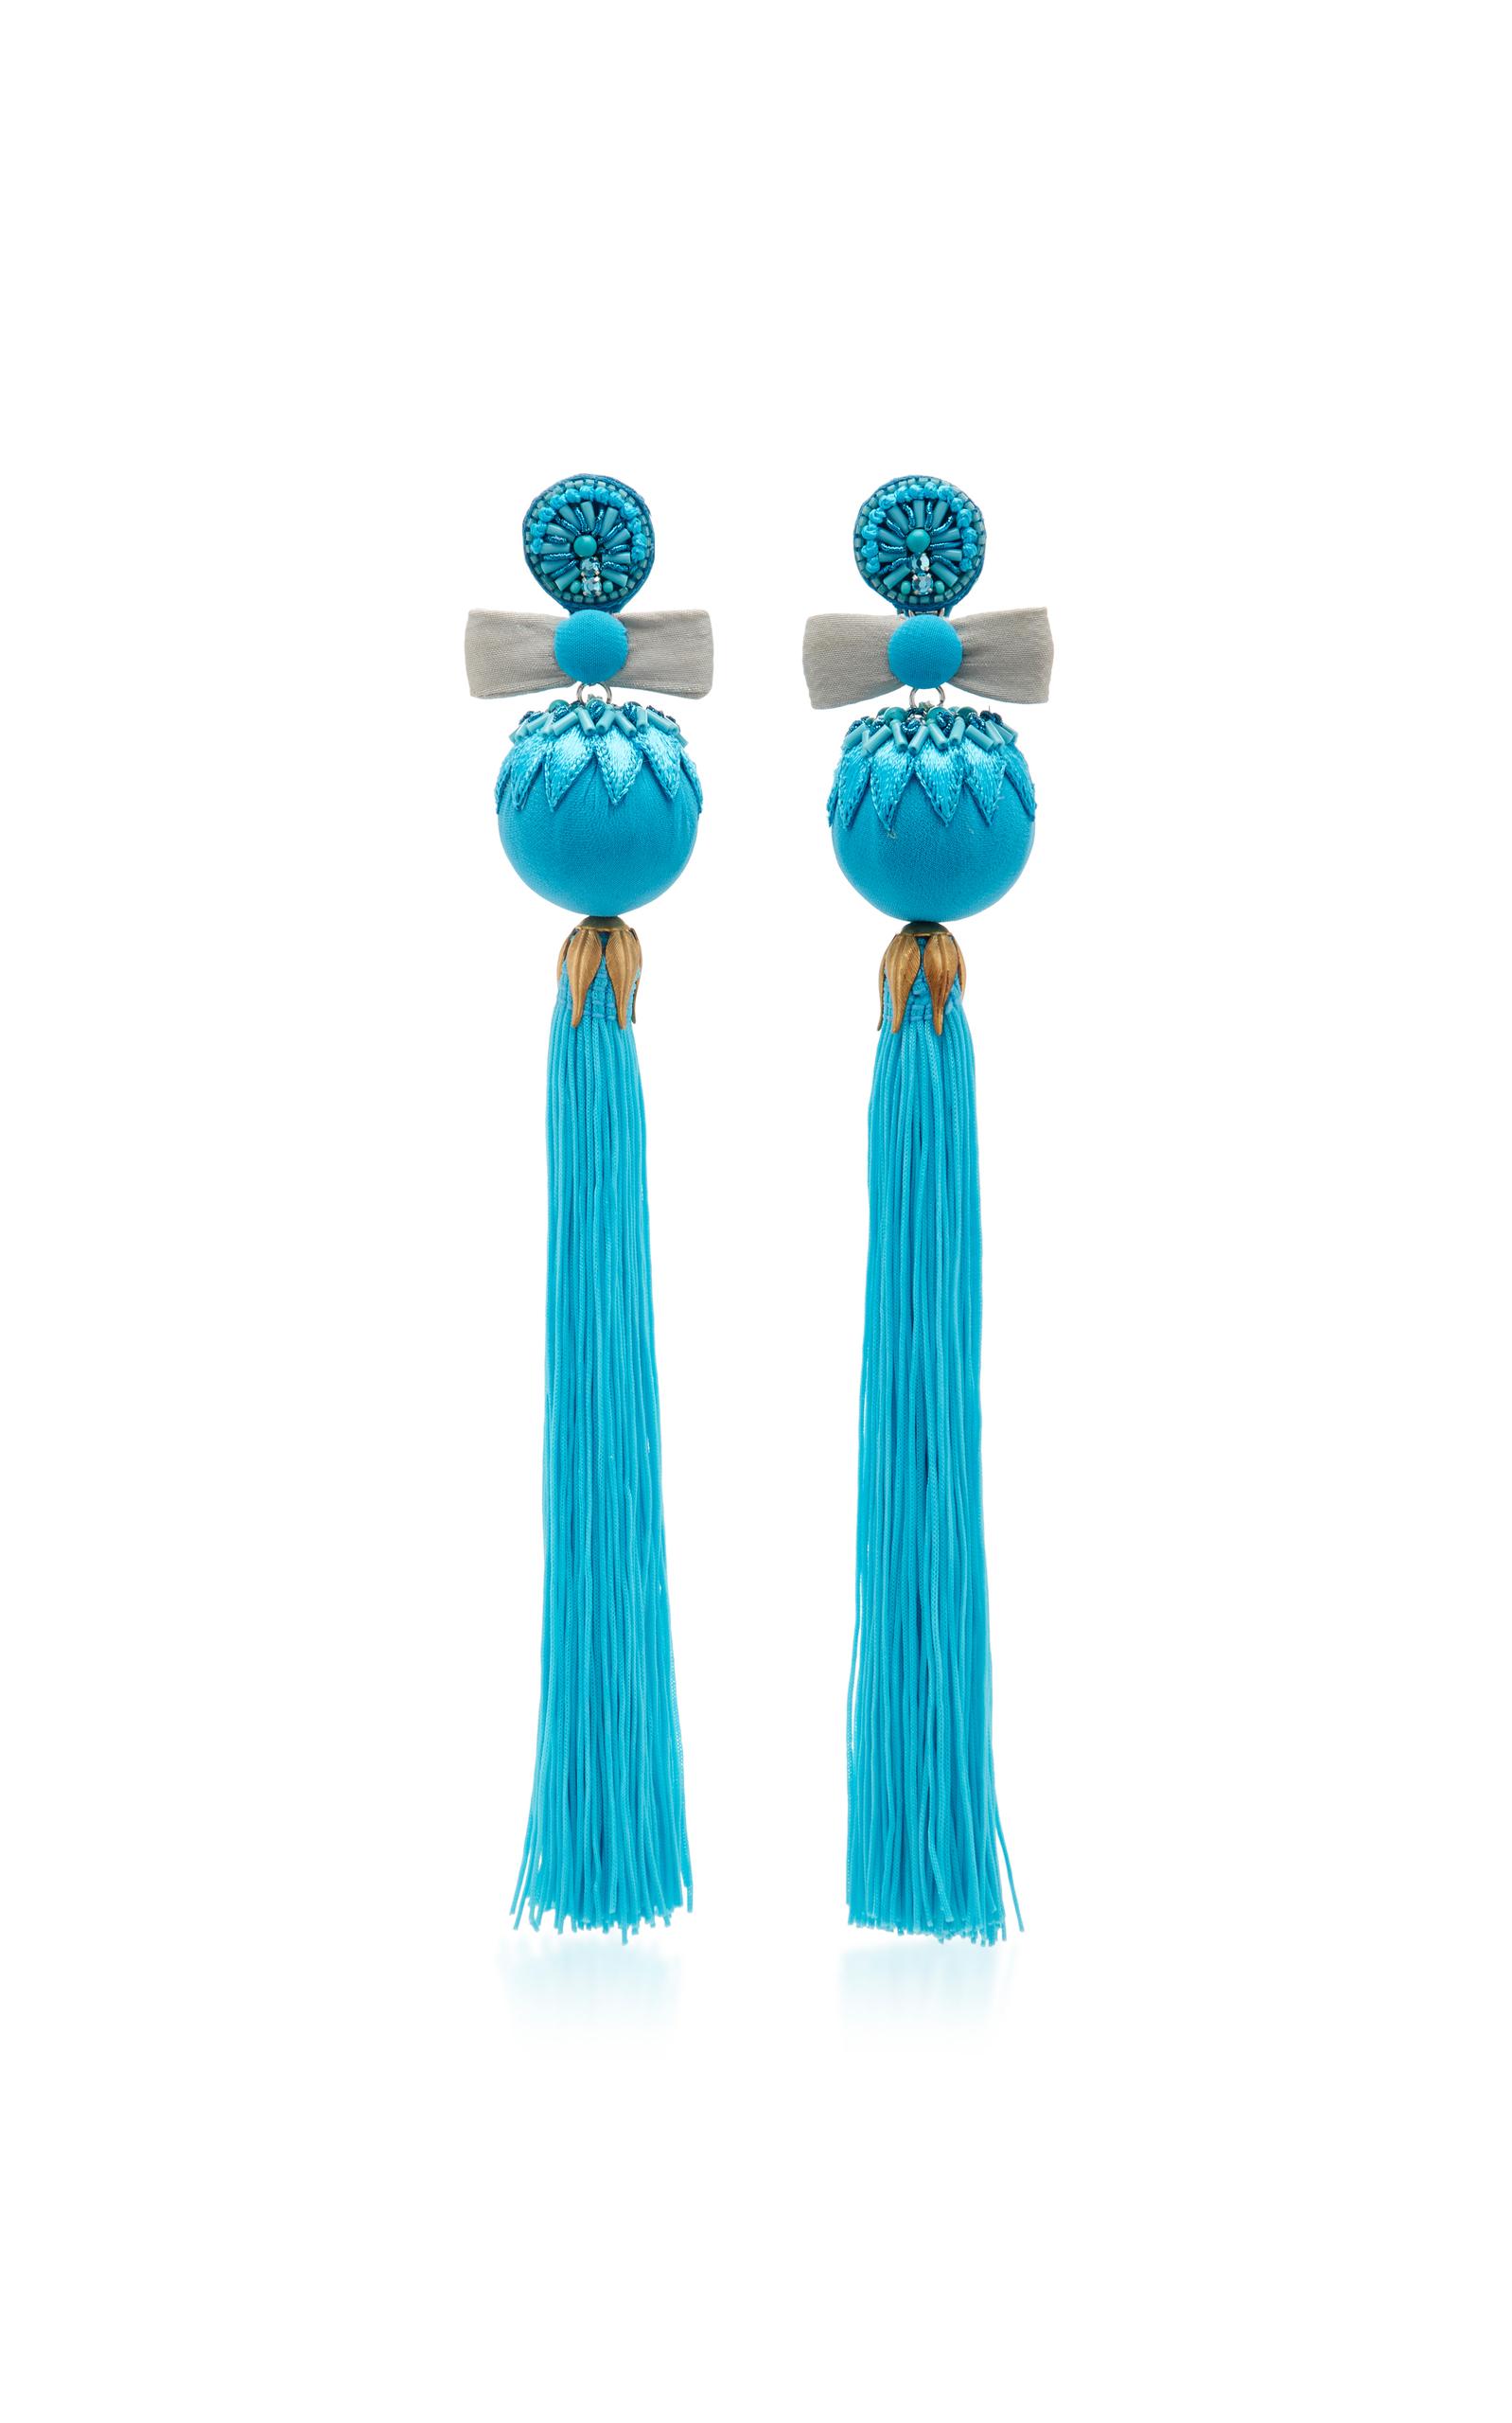 Embellished Tassel Earrings Ranjana Khan 38fdIa